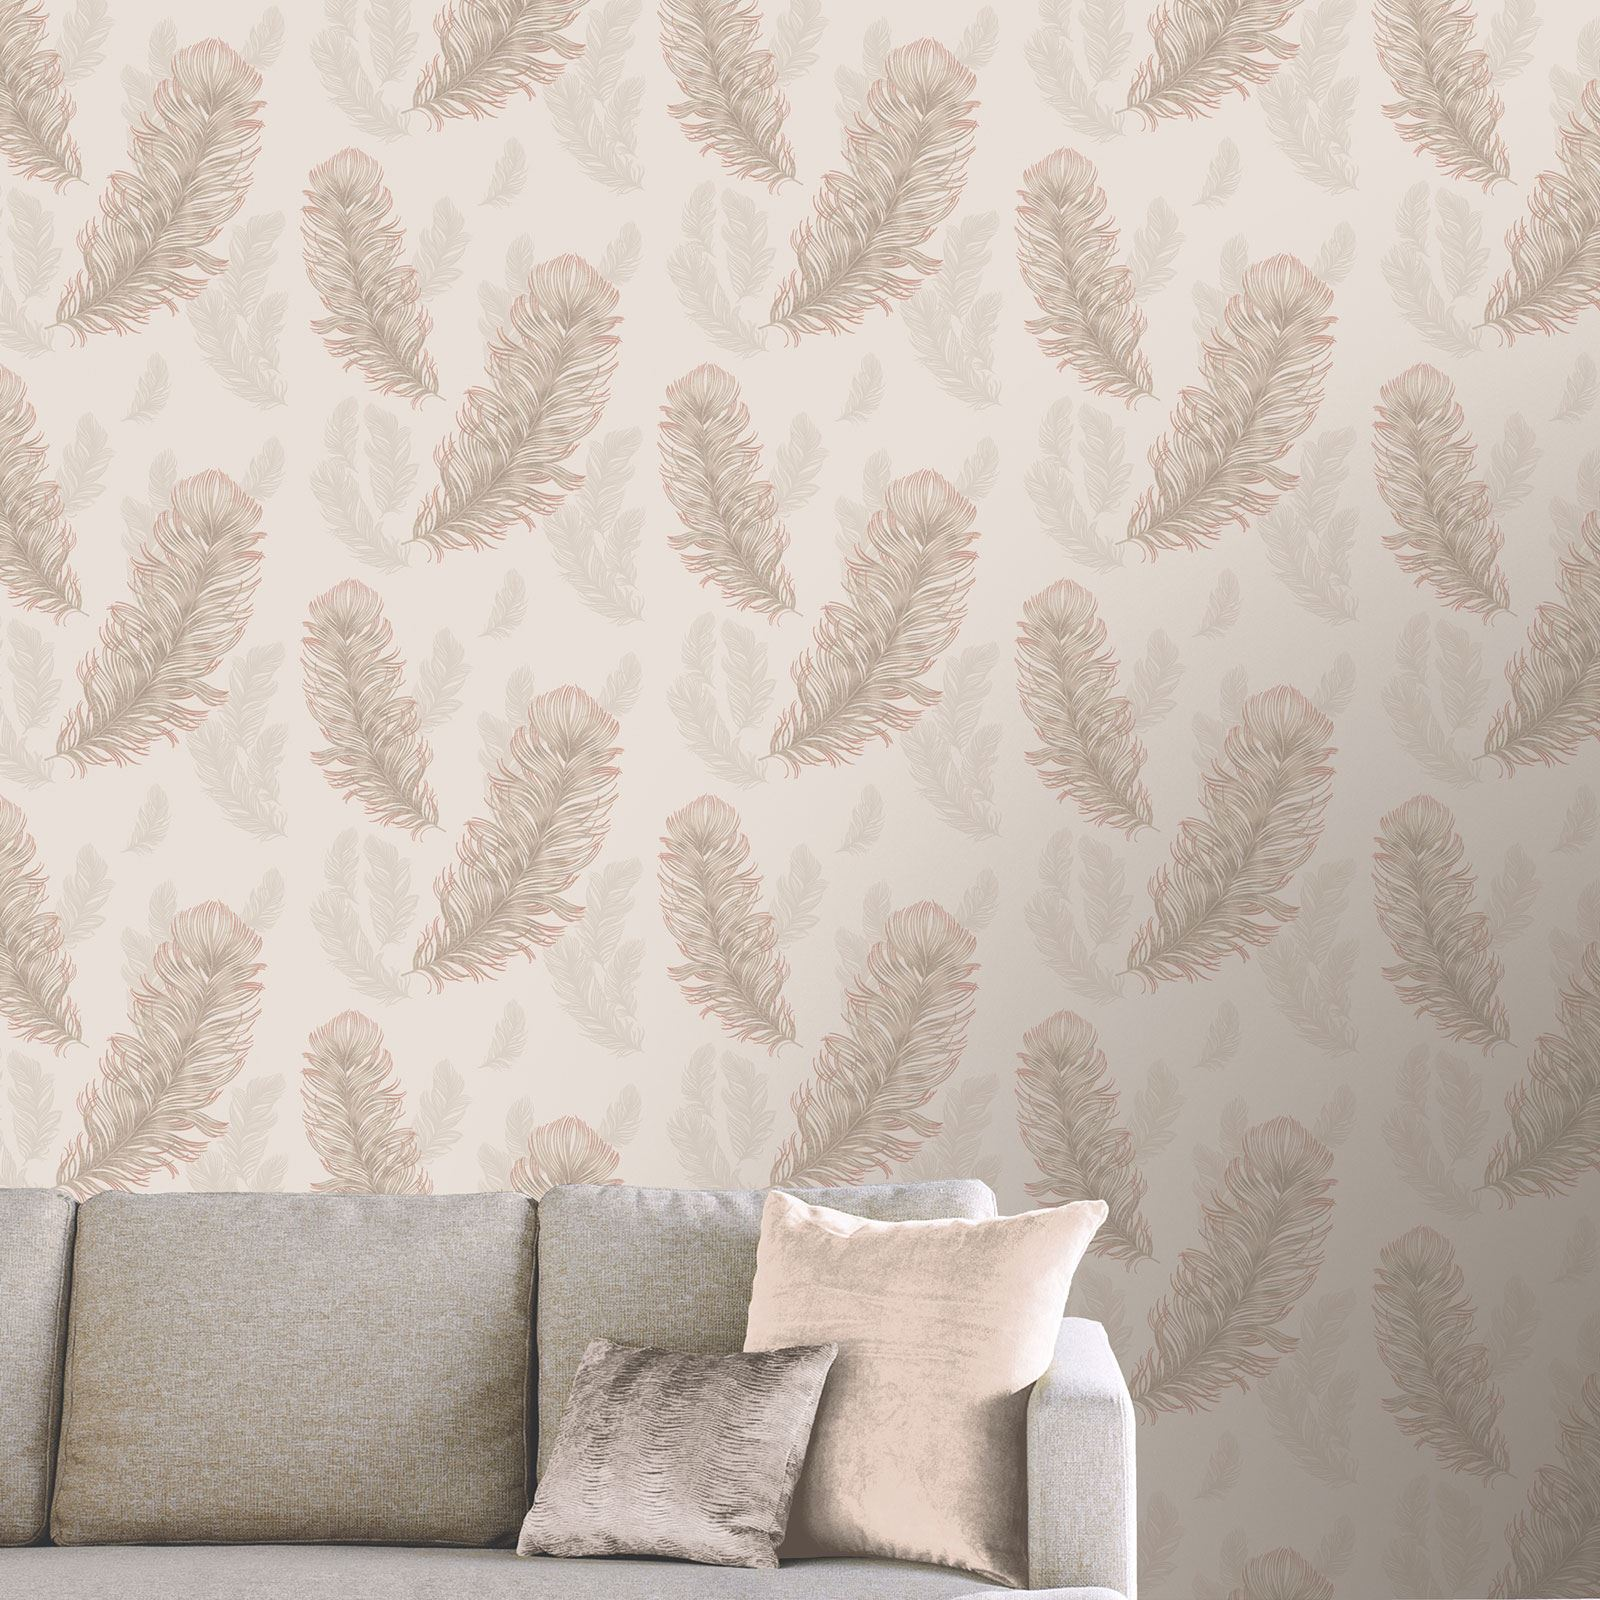 Cool Wallpaper Marble Metallic - 26da558b-f387-4332-9eda-1ae8fed34481  Pictures_906774.jpg